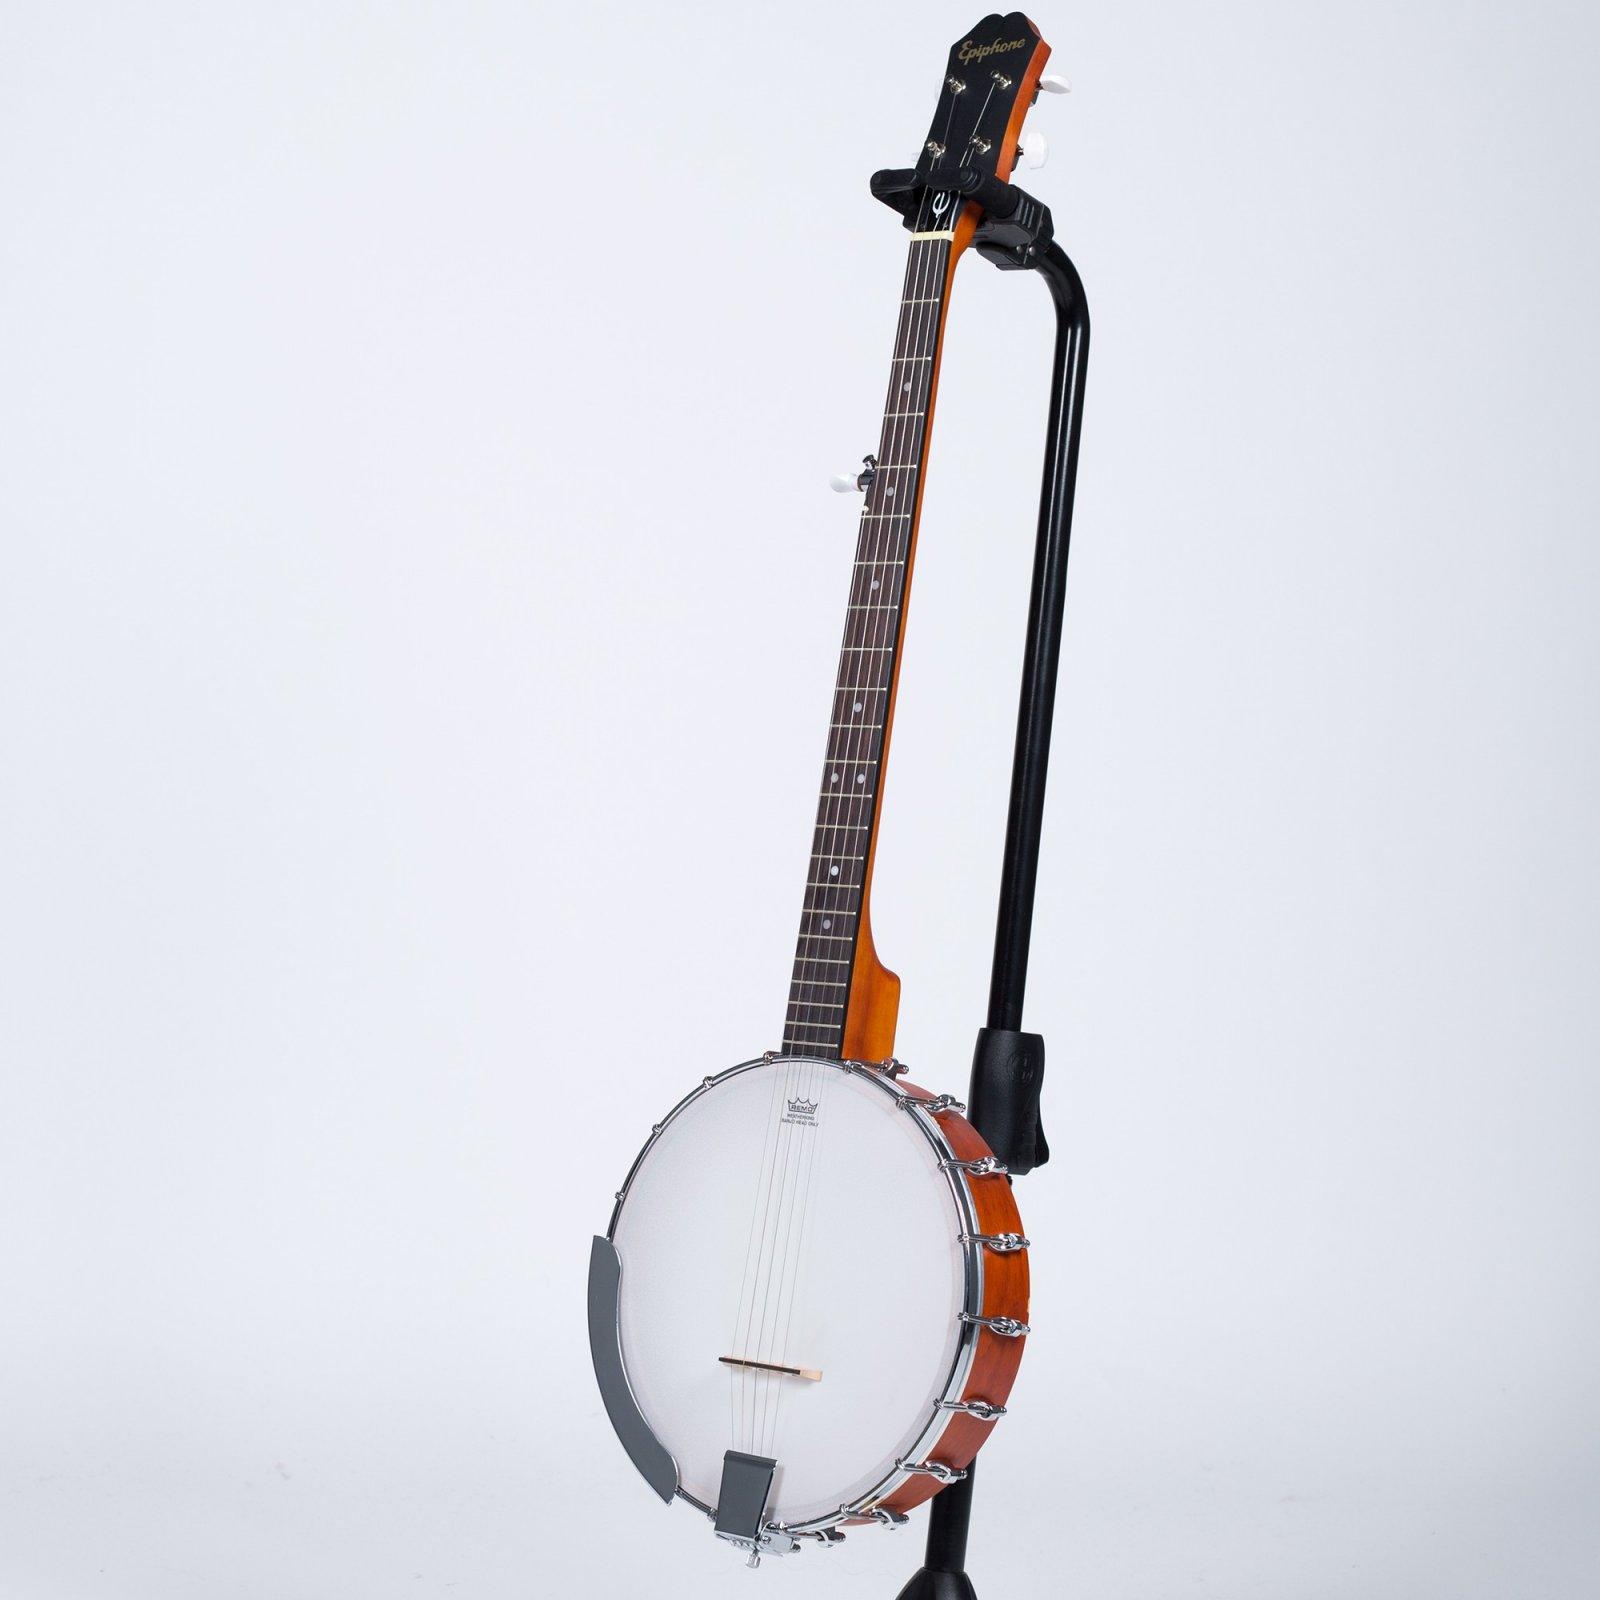 Epiphone MB-100 open back banjo